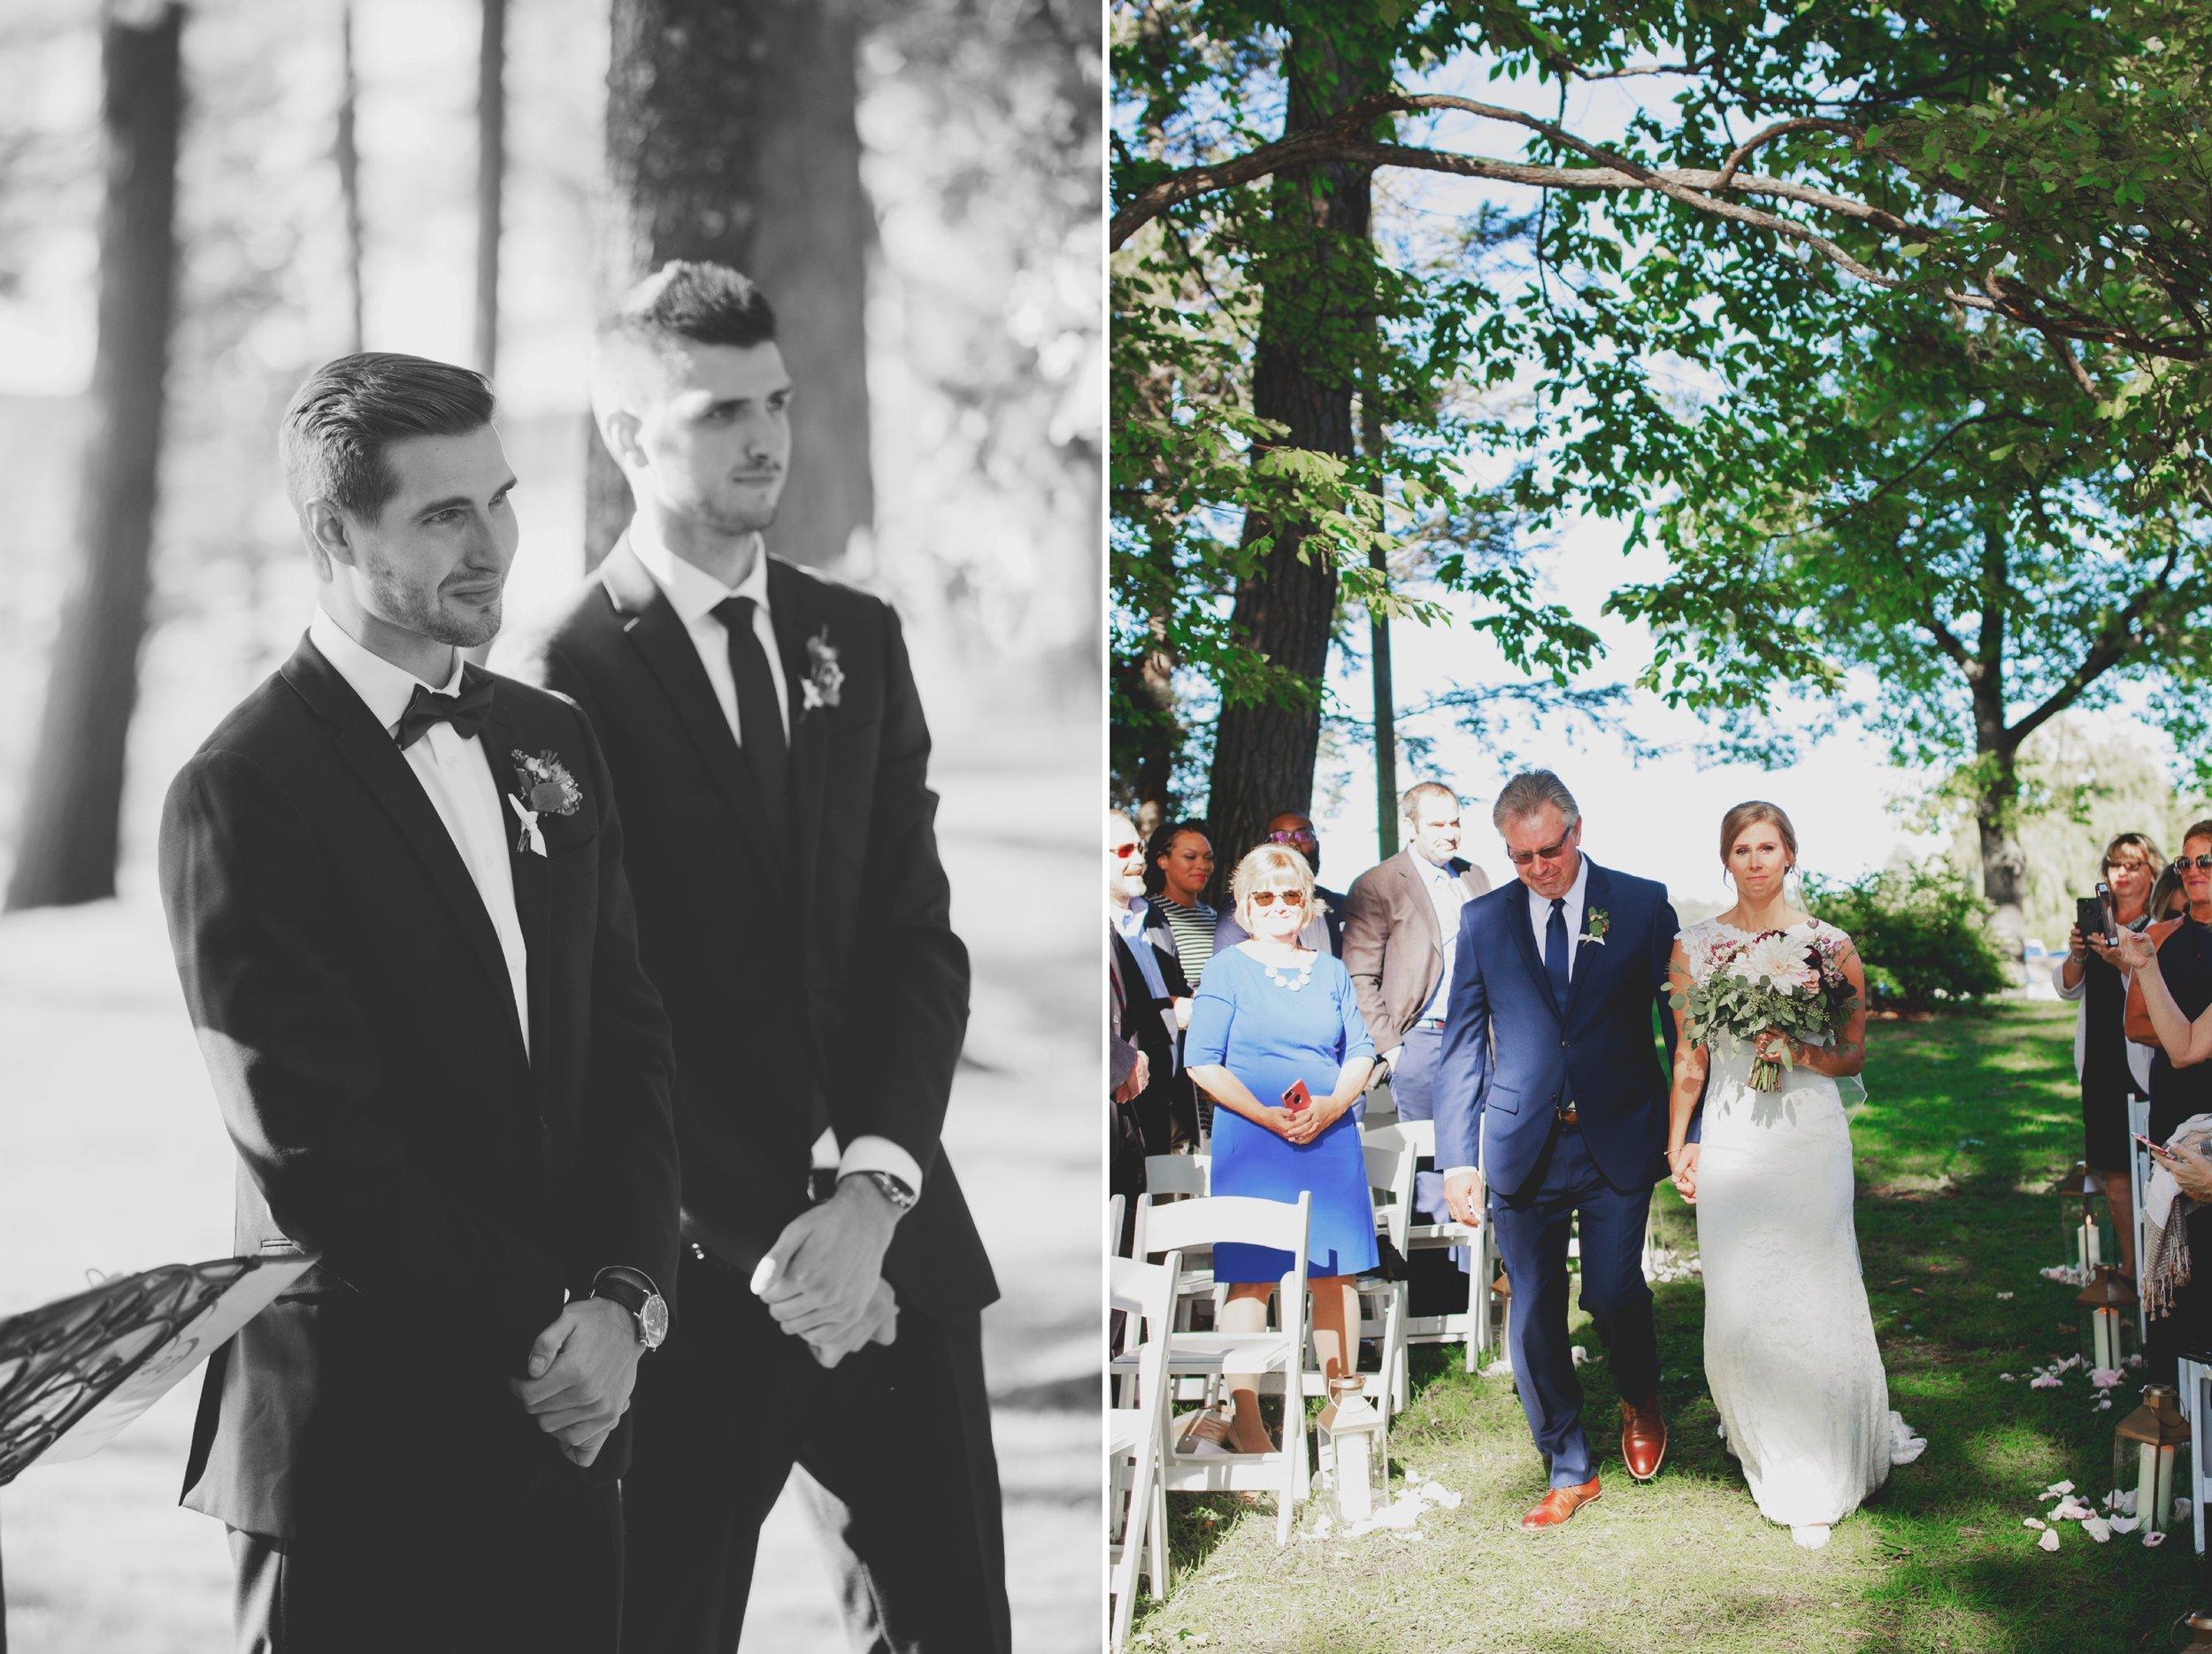 traverse_city_wedding_052.jpg